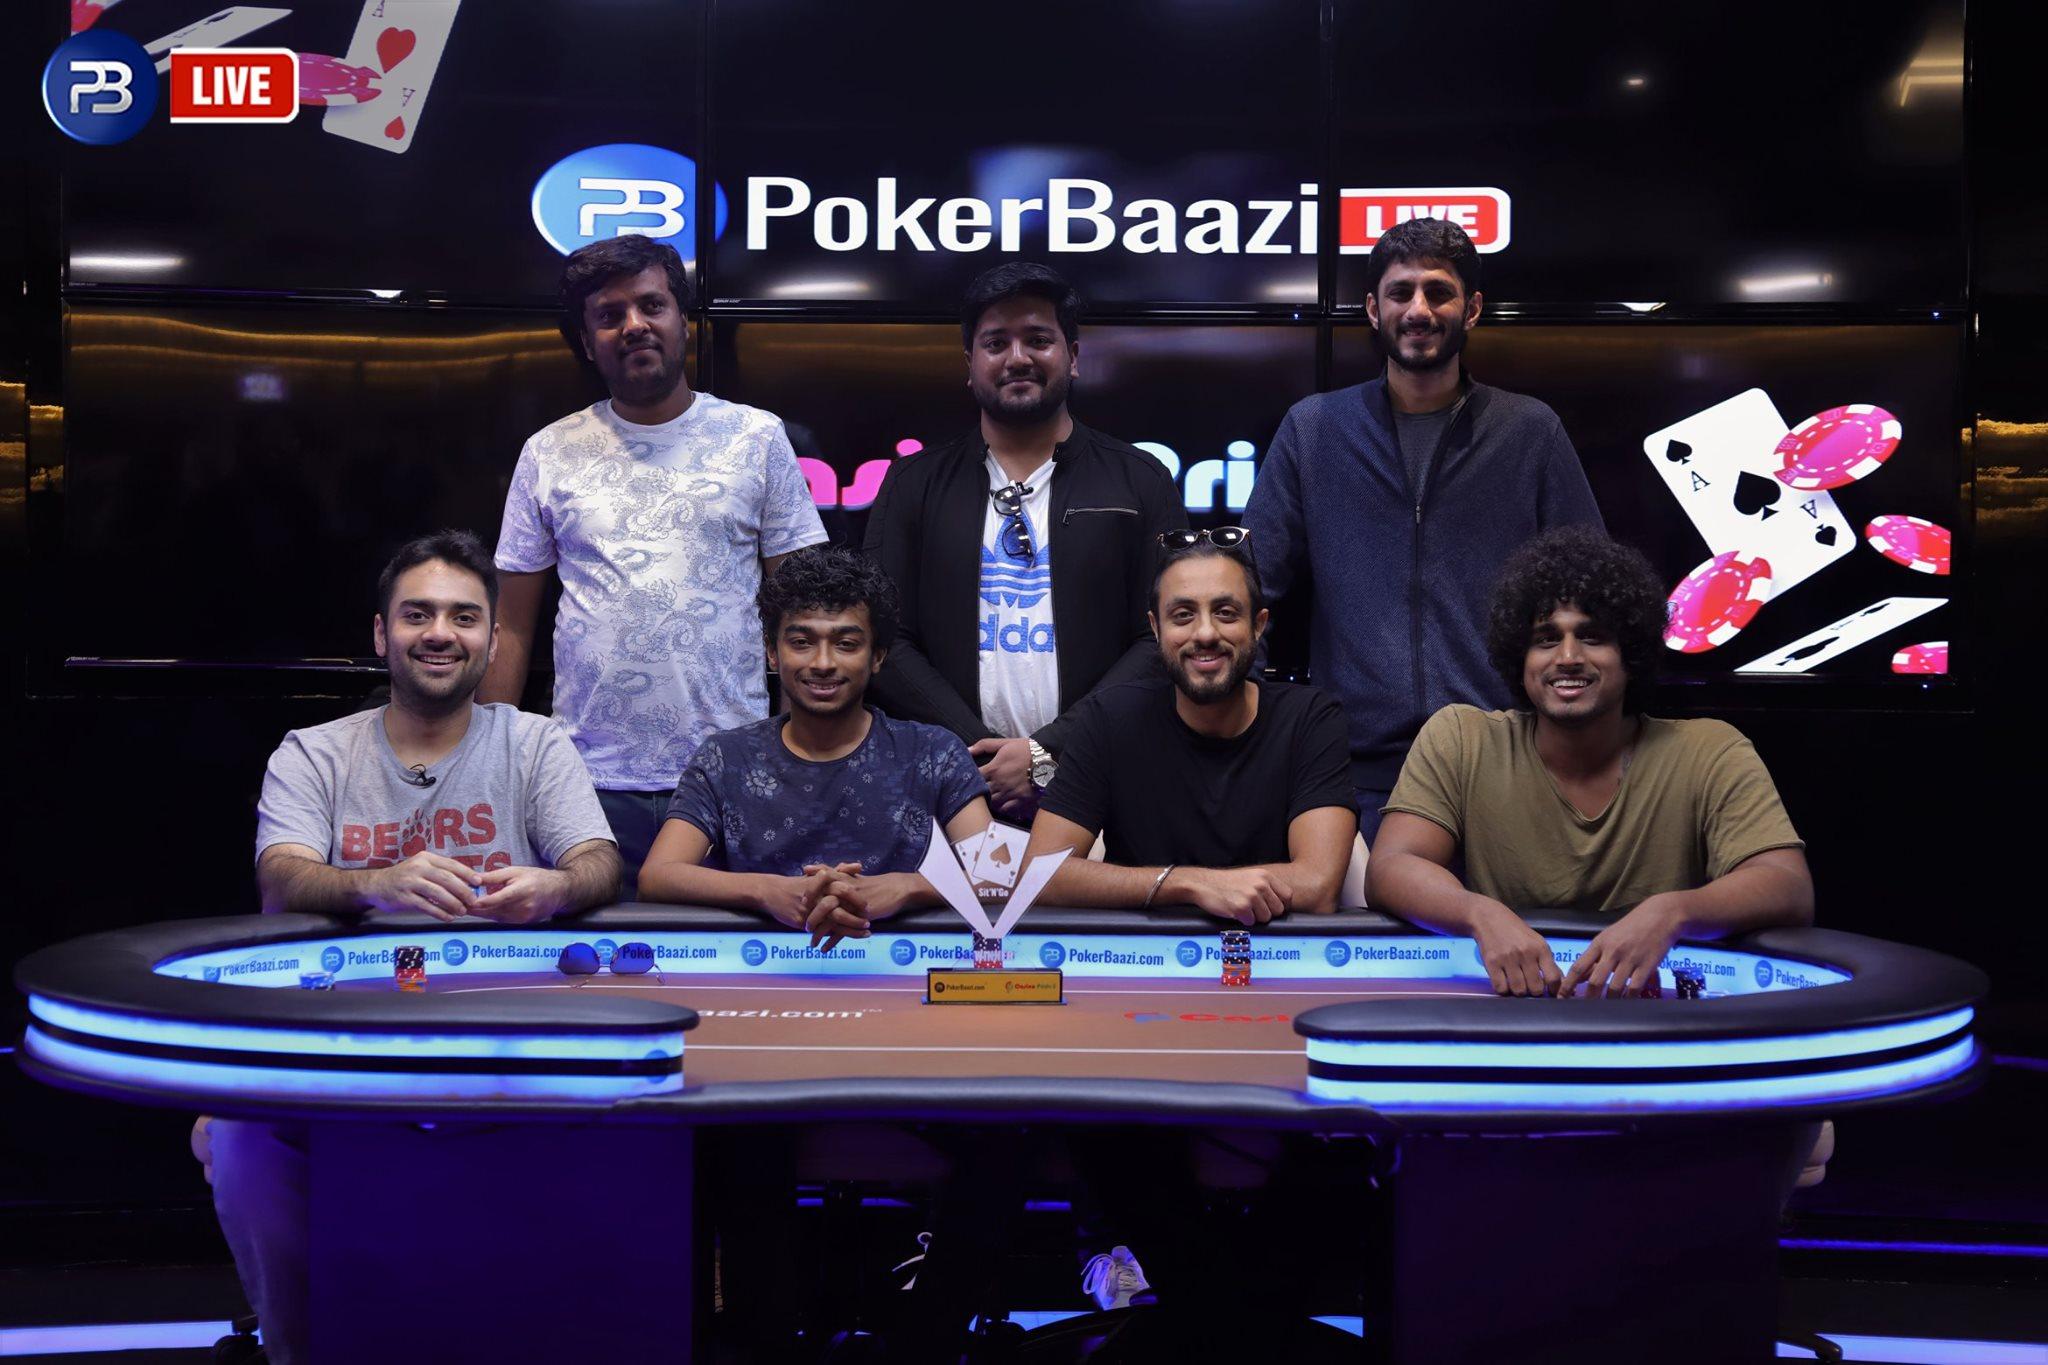 pokerbaazi live